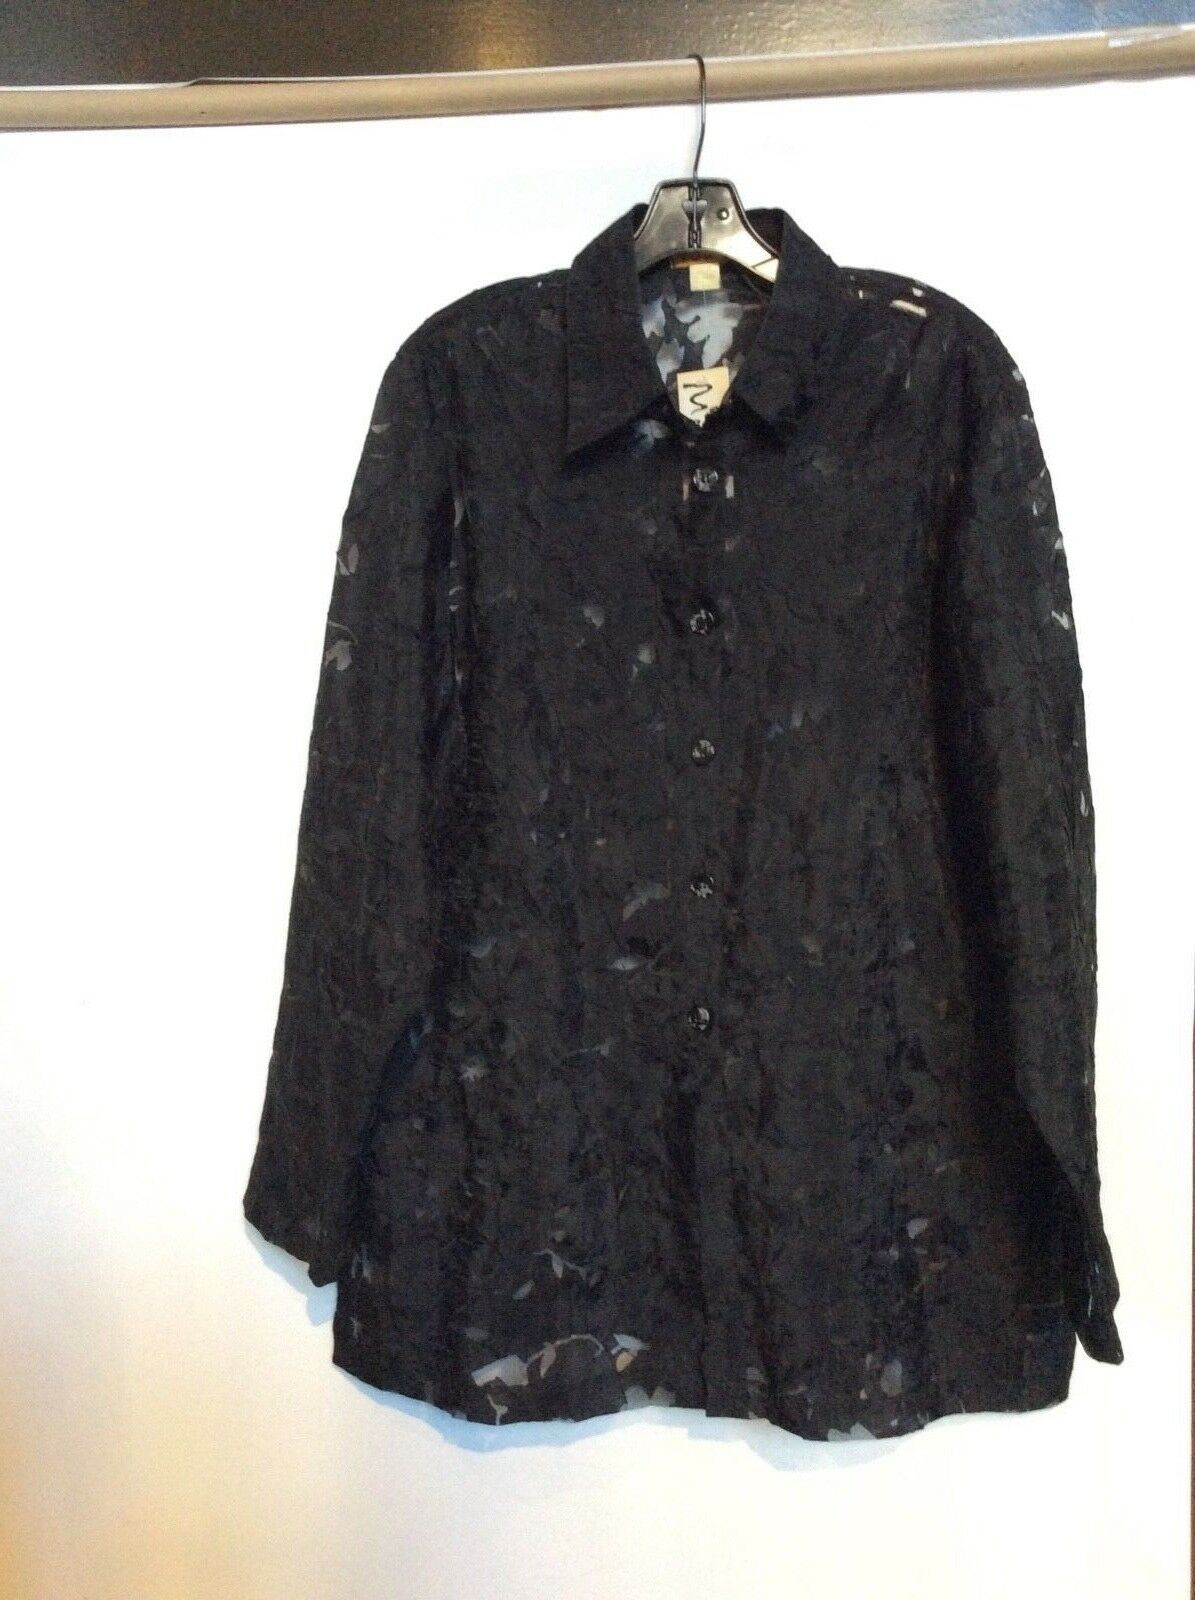 NWT 1X beautiful See through schwarz blouse by Sukik